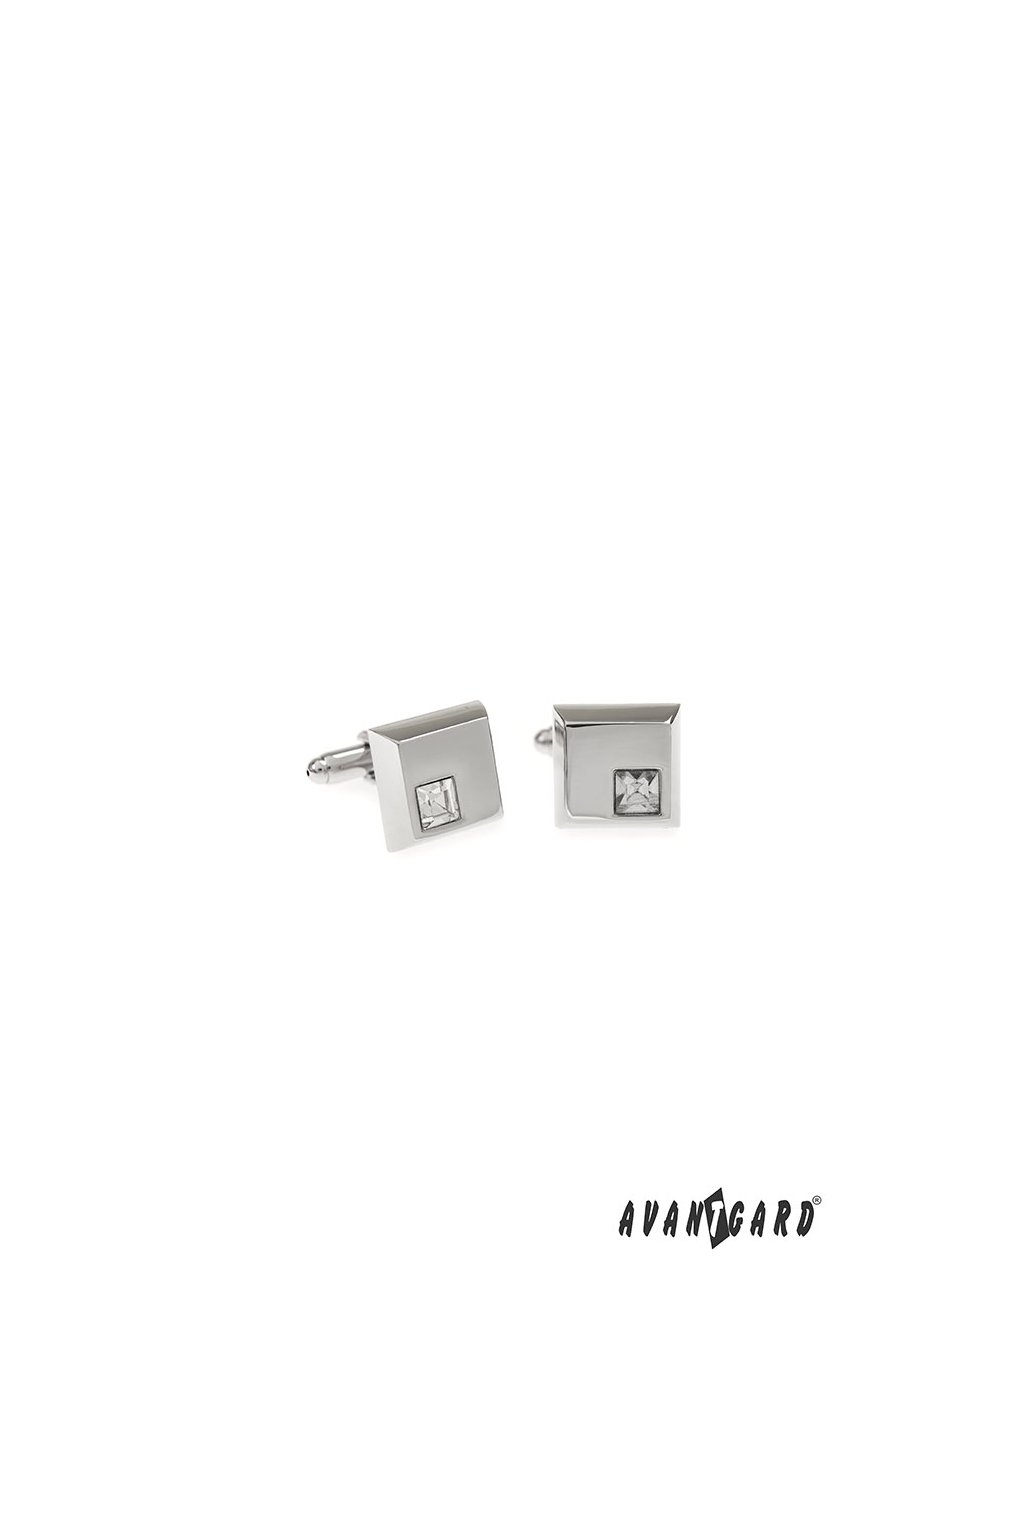 Manžetové knoflíčky PREMIUM stříbrná lesk/bílá 573 - 20633